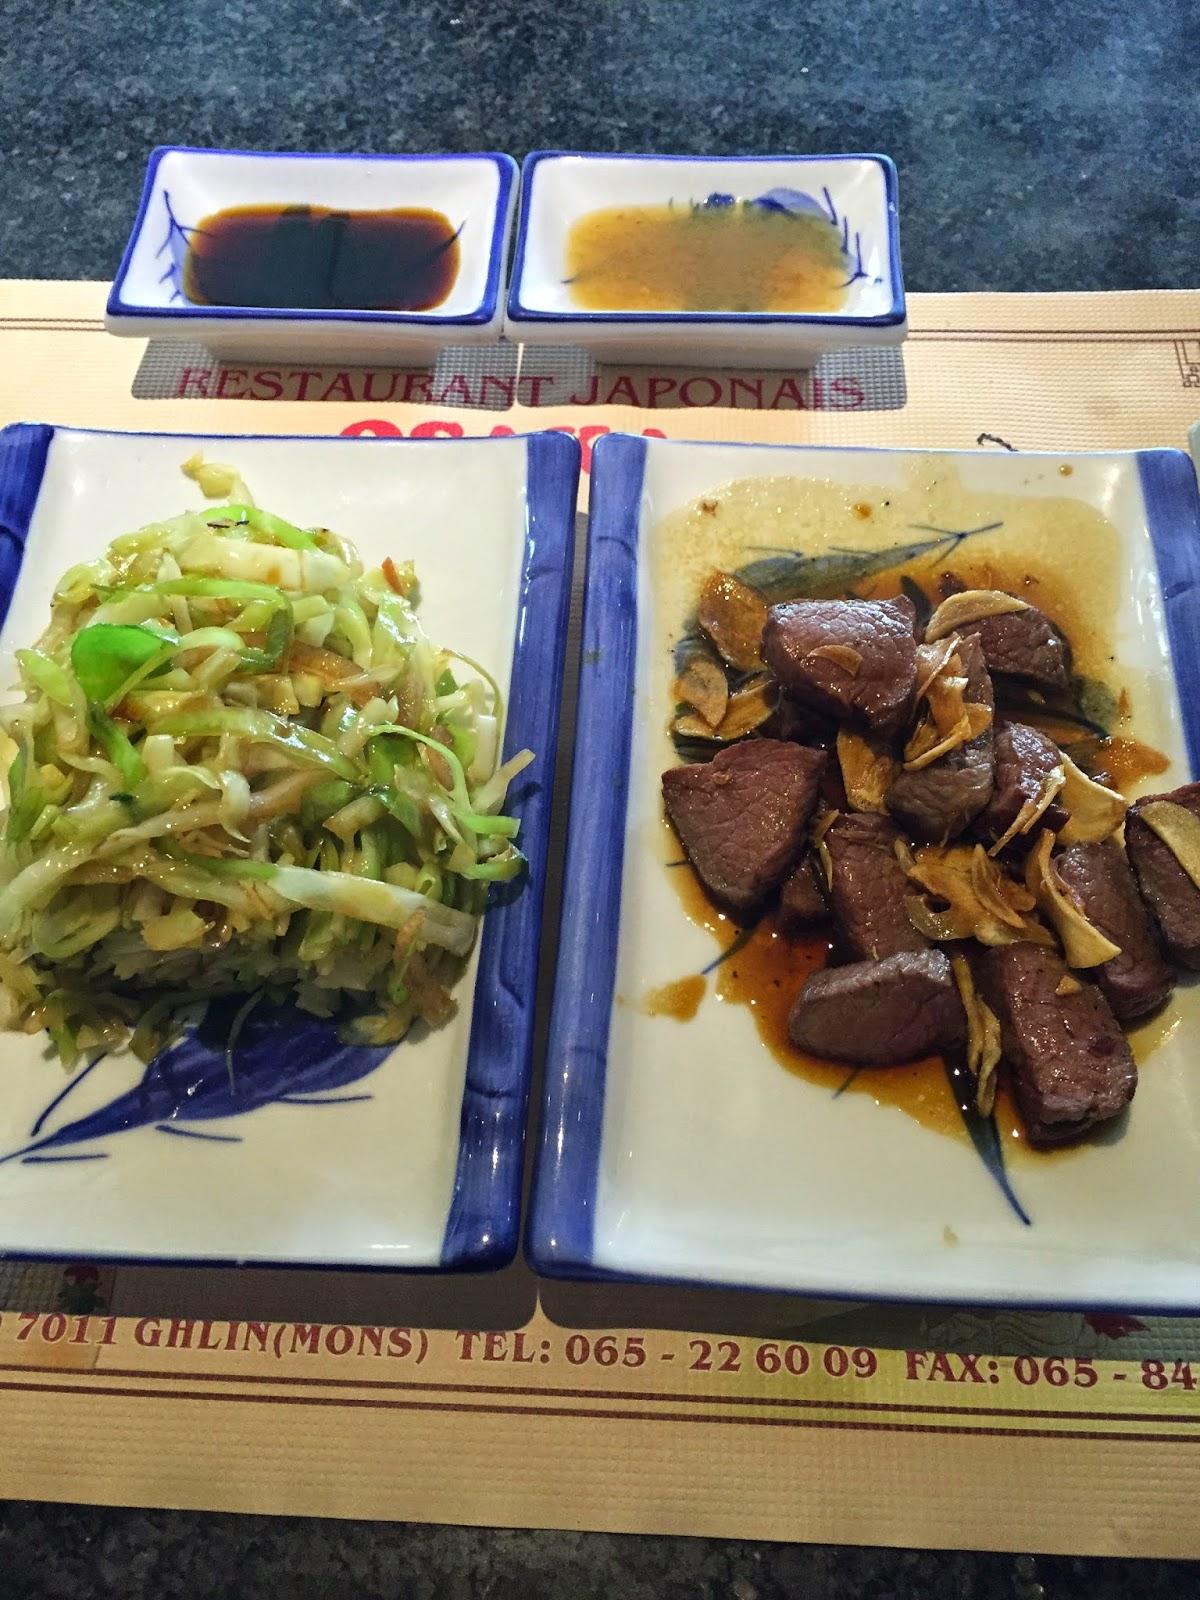 Osaka restaurant japonais ghlin mons - Restaurant japonais cuisine devant vous ...